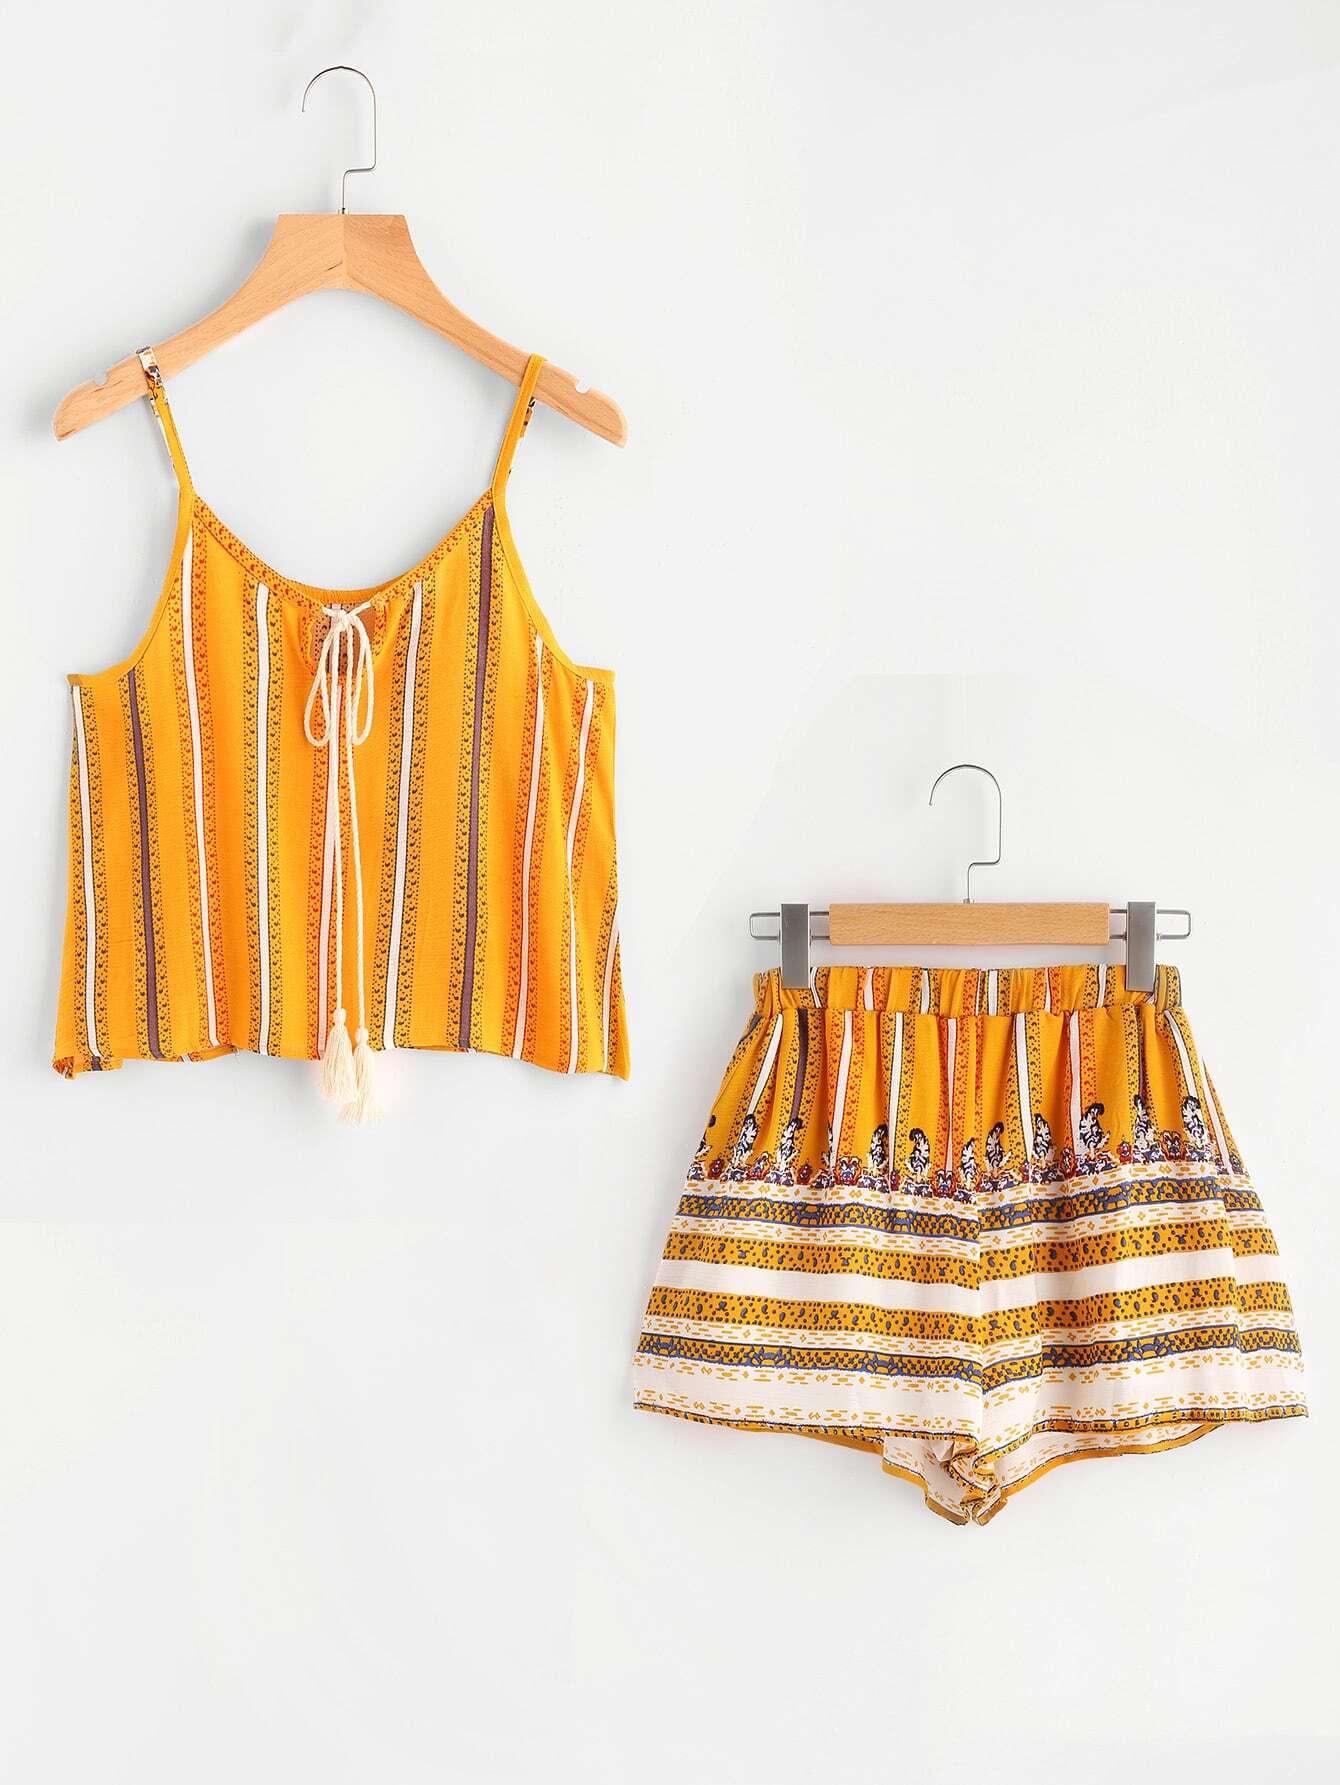 Фото Tribal Print Fringed Tie Neck Cami Top With Shorts. Купить с доставкой